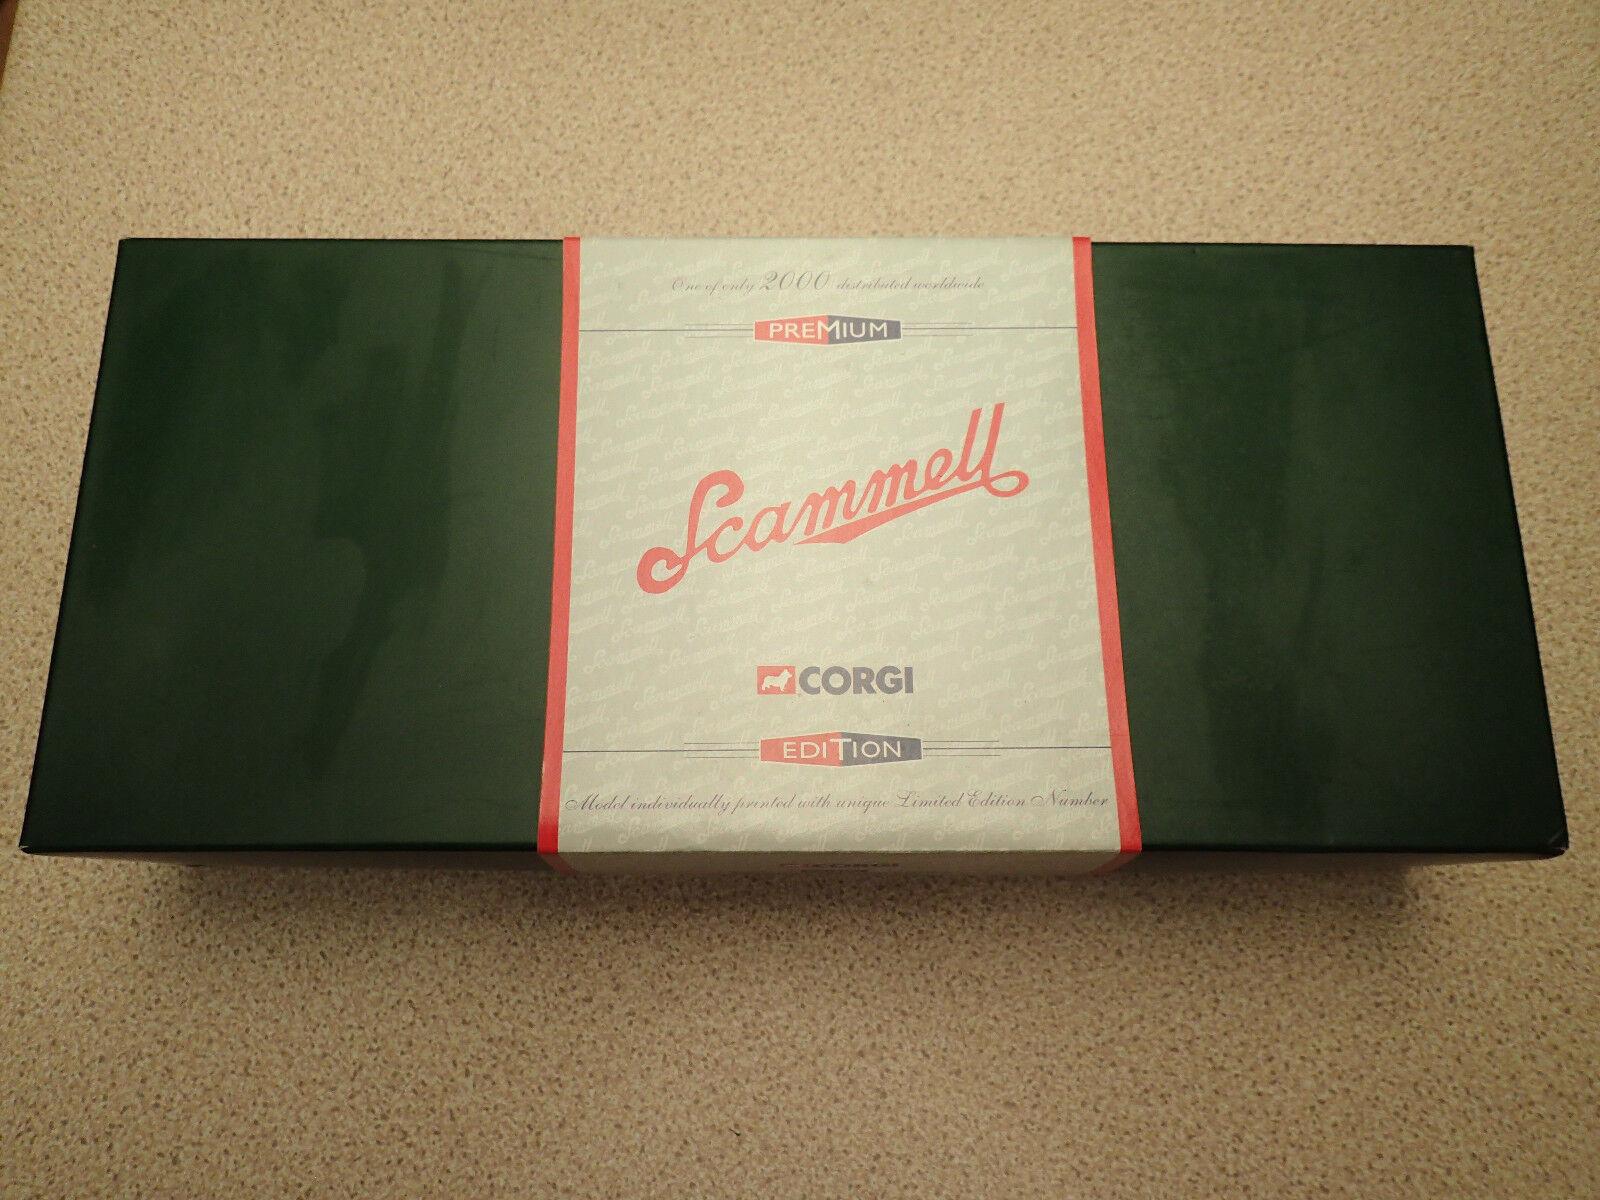 Corgi 1 50 Premium Edition CC10704 Scammell Highwayman Westfield Trans Untouched